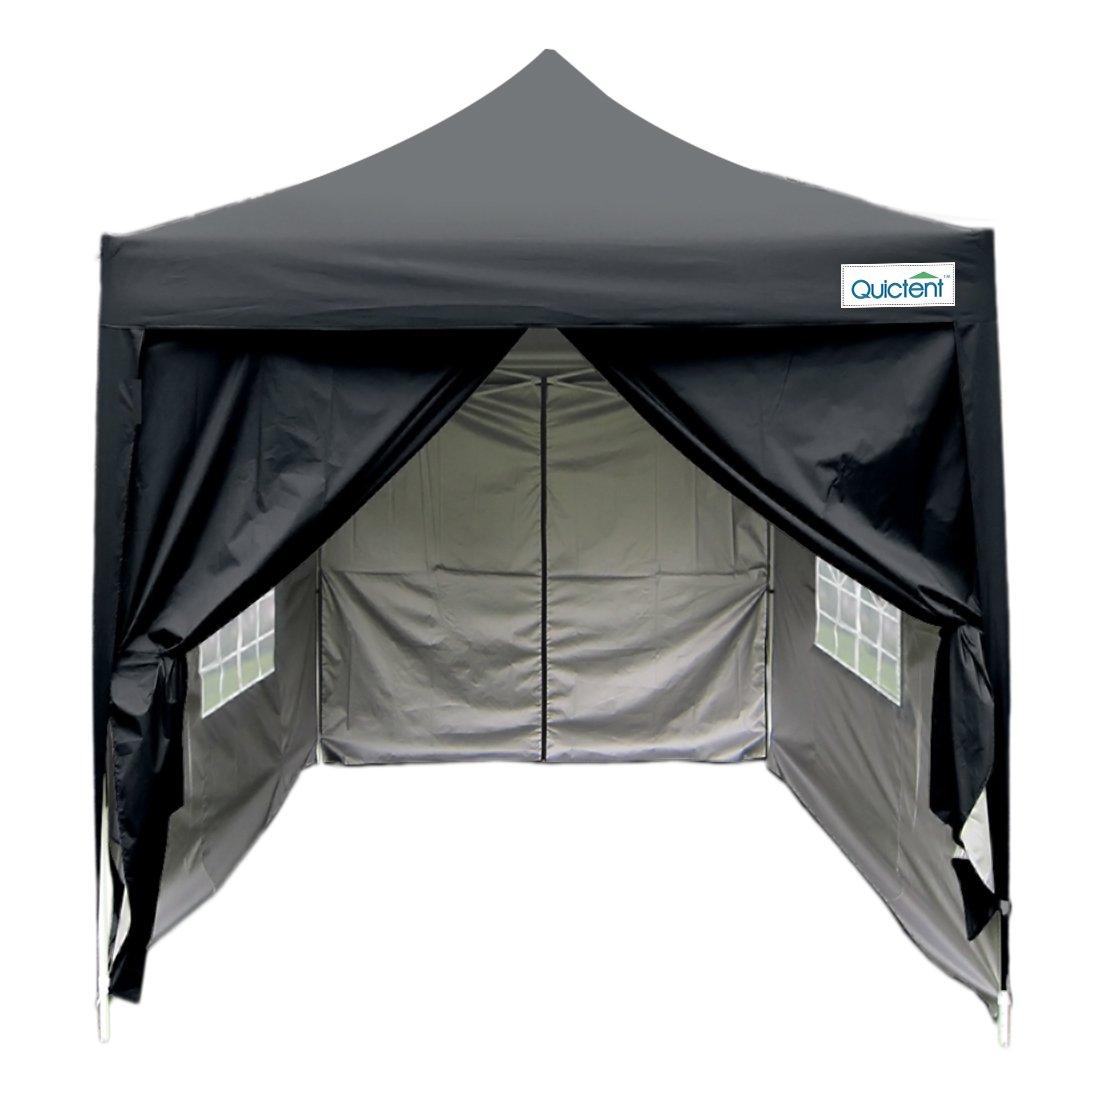 Quictent Silvox 6.6' X 6.6' Ez Set Pop up Gazebo Party Wedding Tent Canopy Marquee +4 Sidewalls +carry Bag 100% Waterproof …